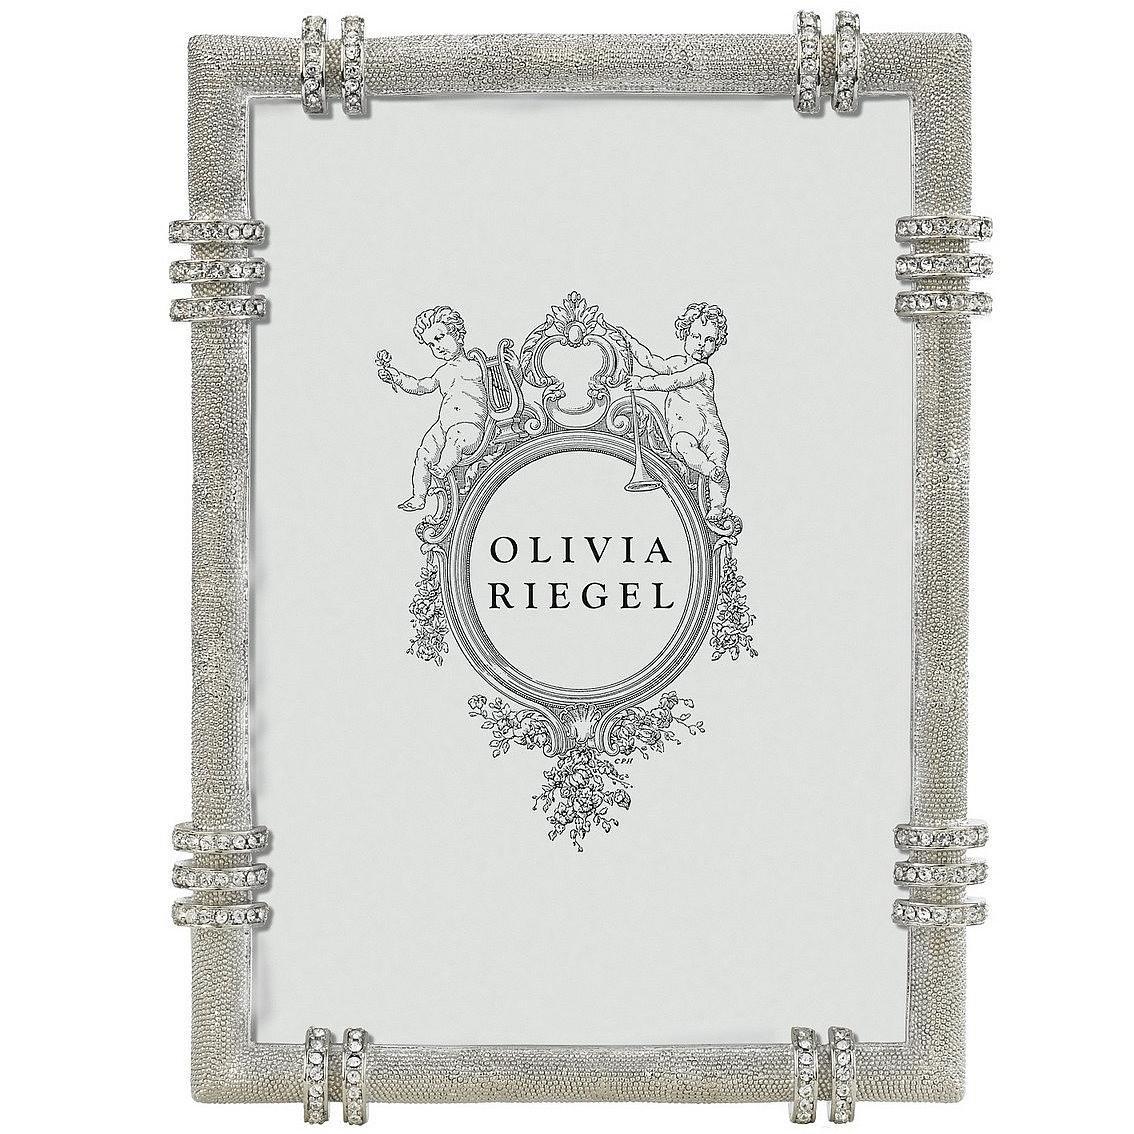 CASSINI Austrian Crystal 5x7 frame by Olivia Riegel - 5x7